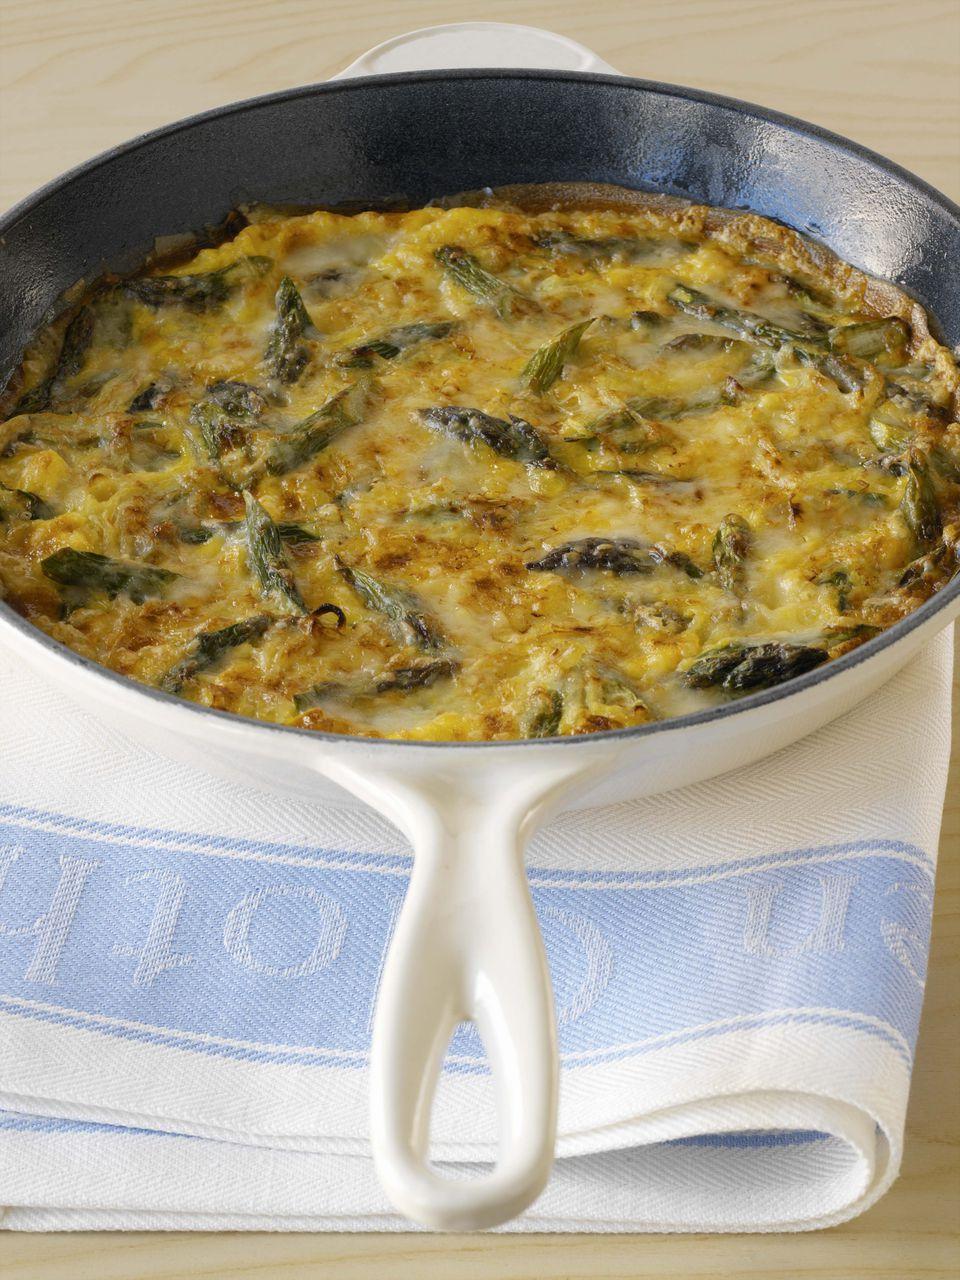 Lamb and asparagus frittata